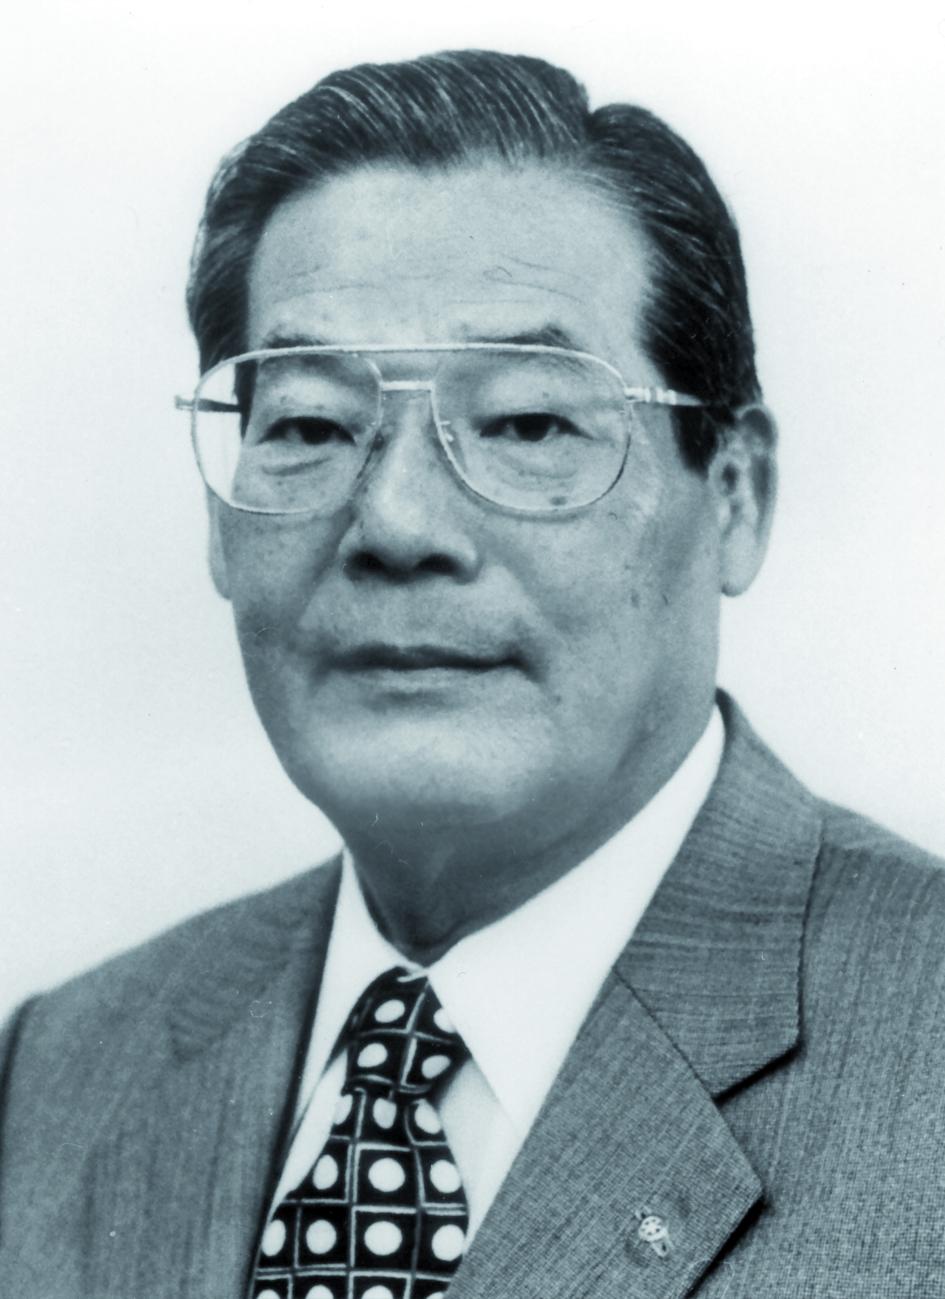 Portraitfoto von Herrn Heizaburou Ichikawa.